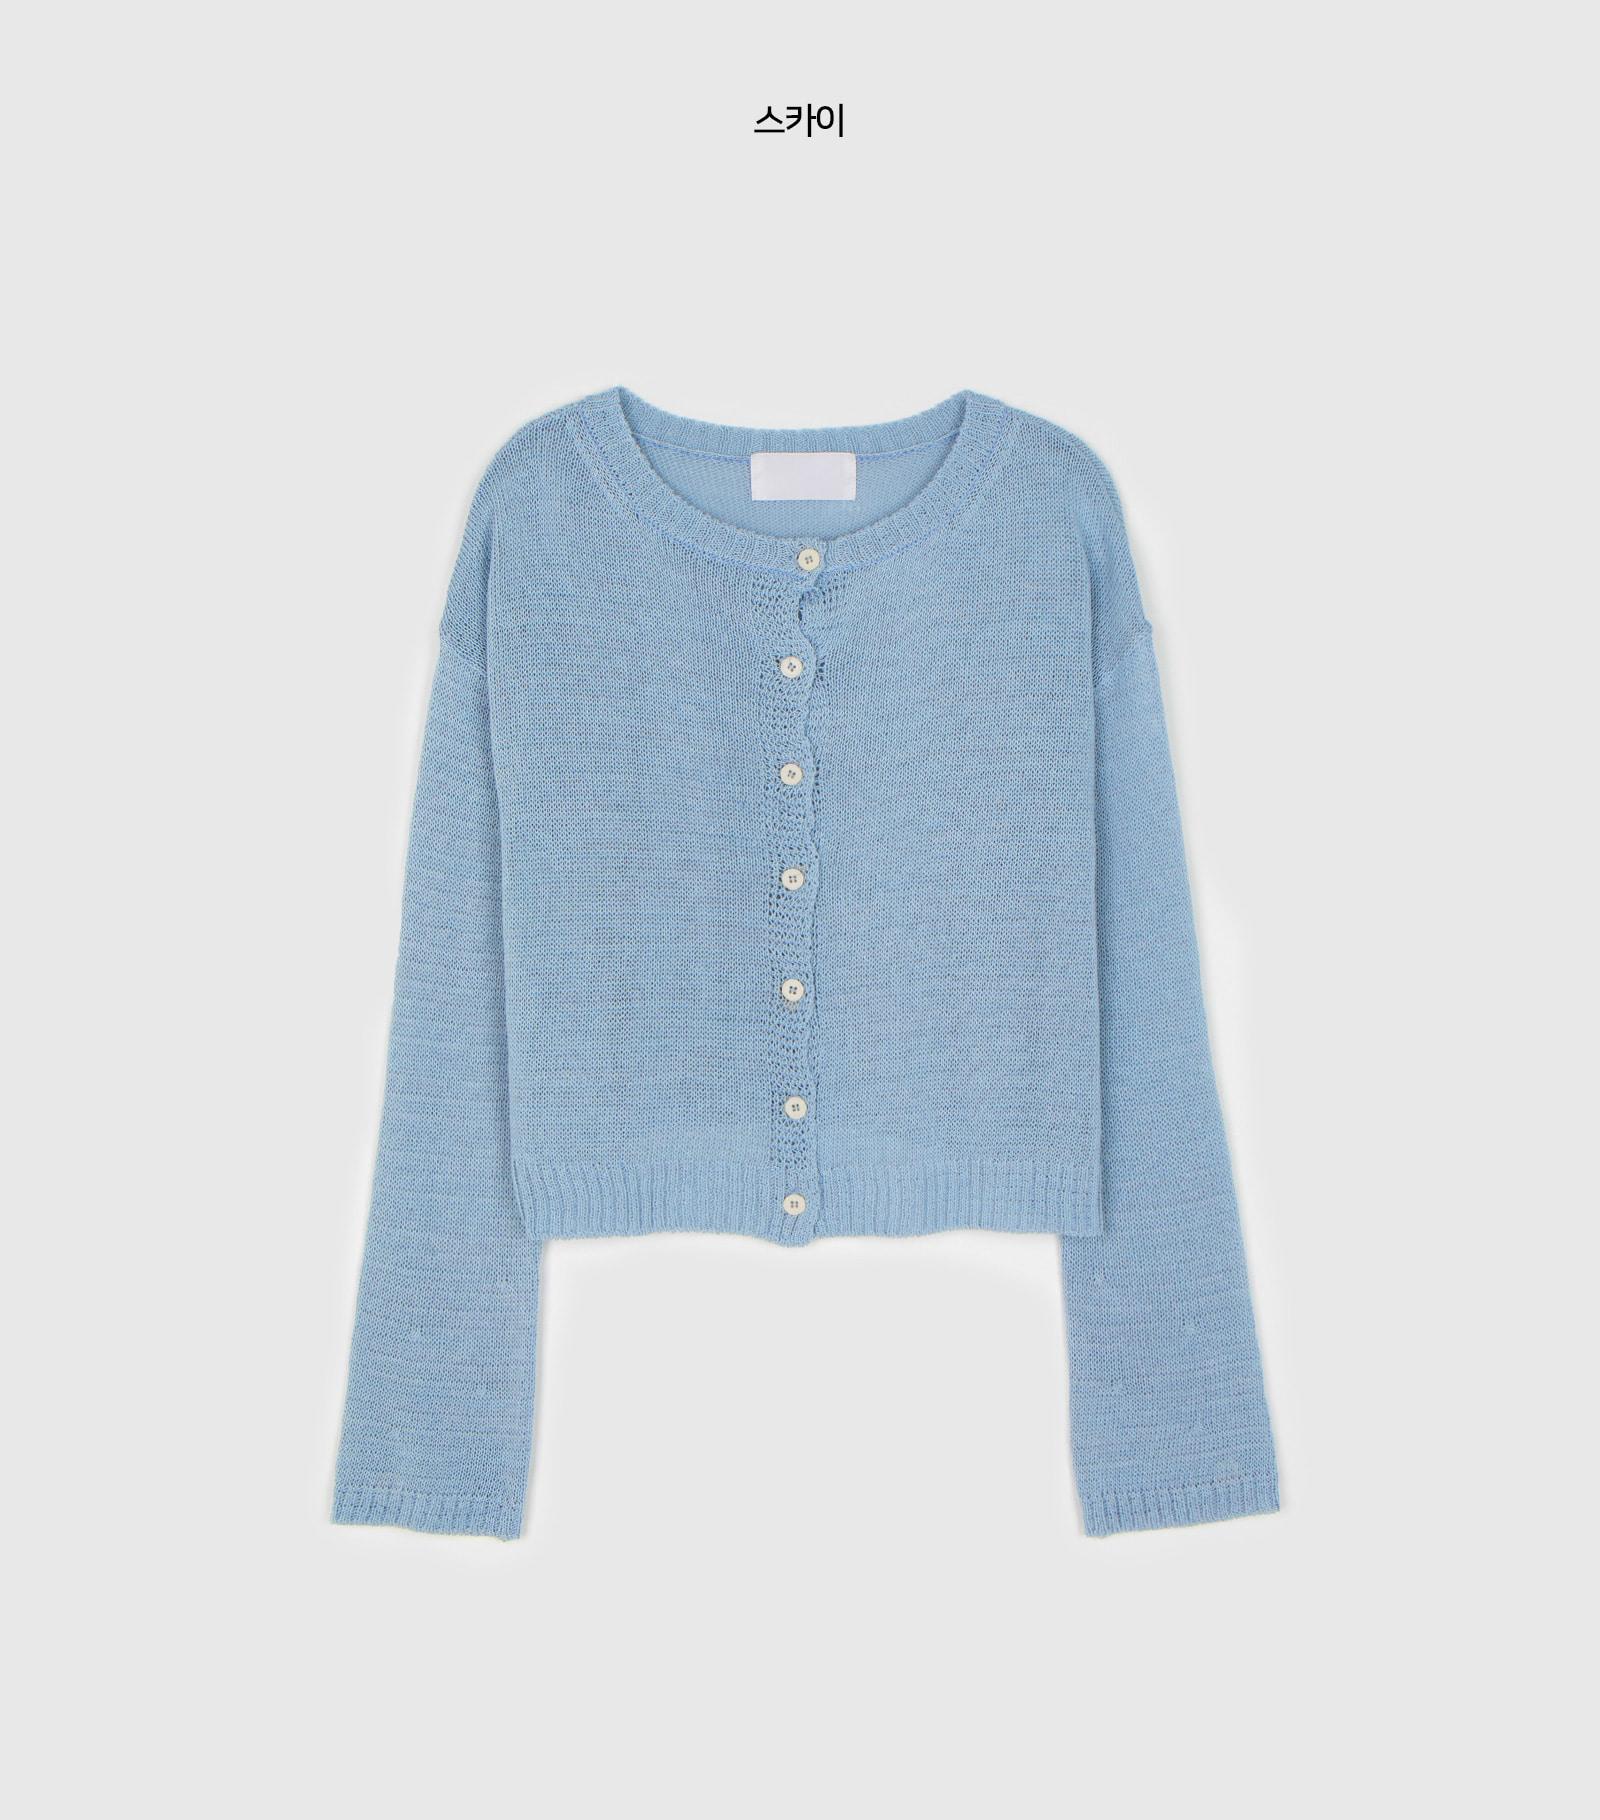 Rosa round-neck knit cardigan